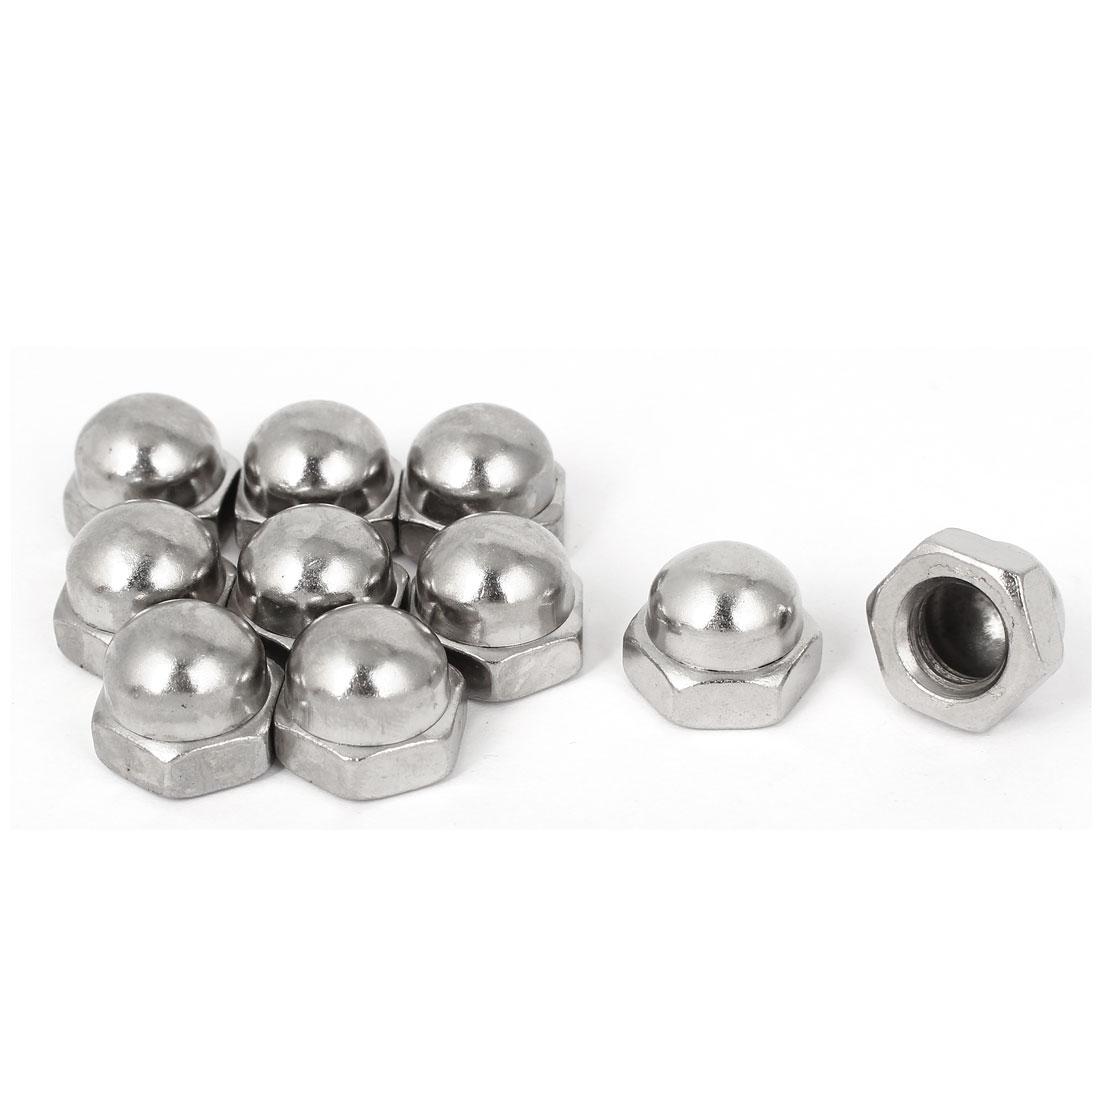 M12 x 1.75mm Pitch Carbon Steel Dome Head Hex Acorn Caps Nuts DIN1587 10PCS